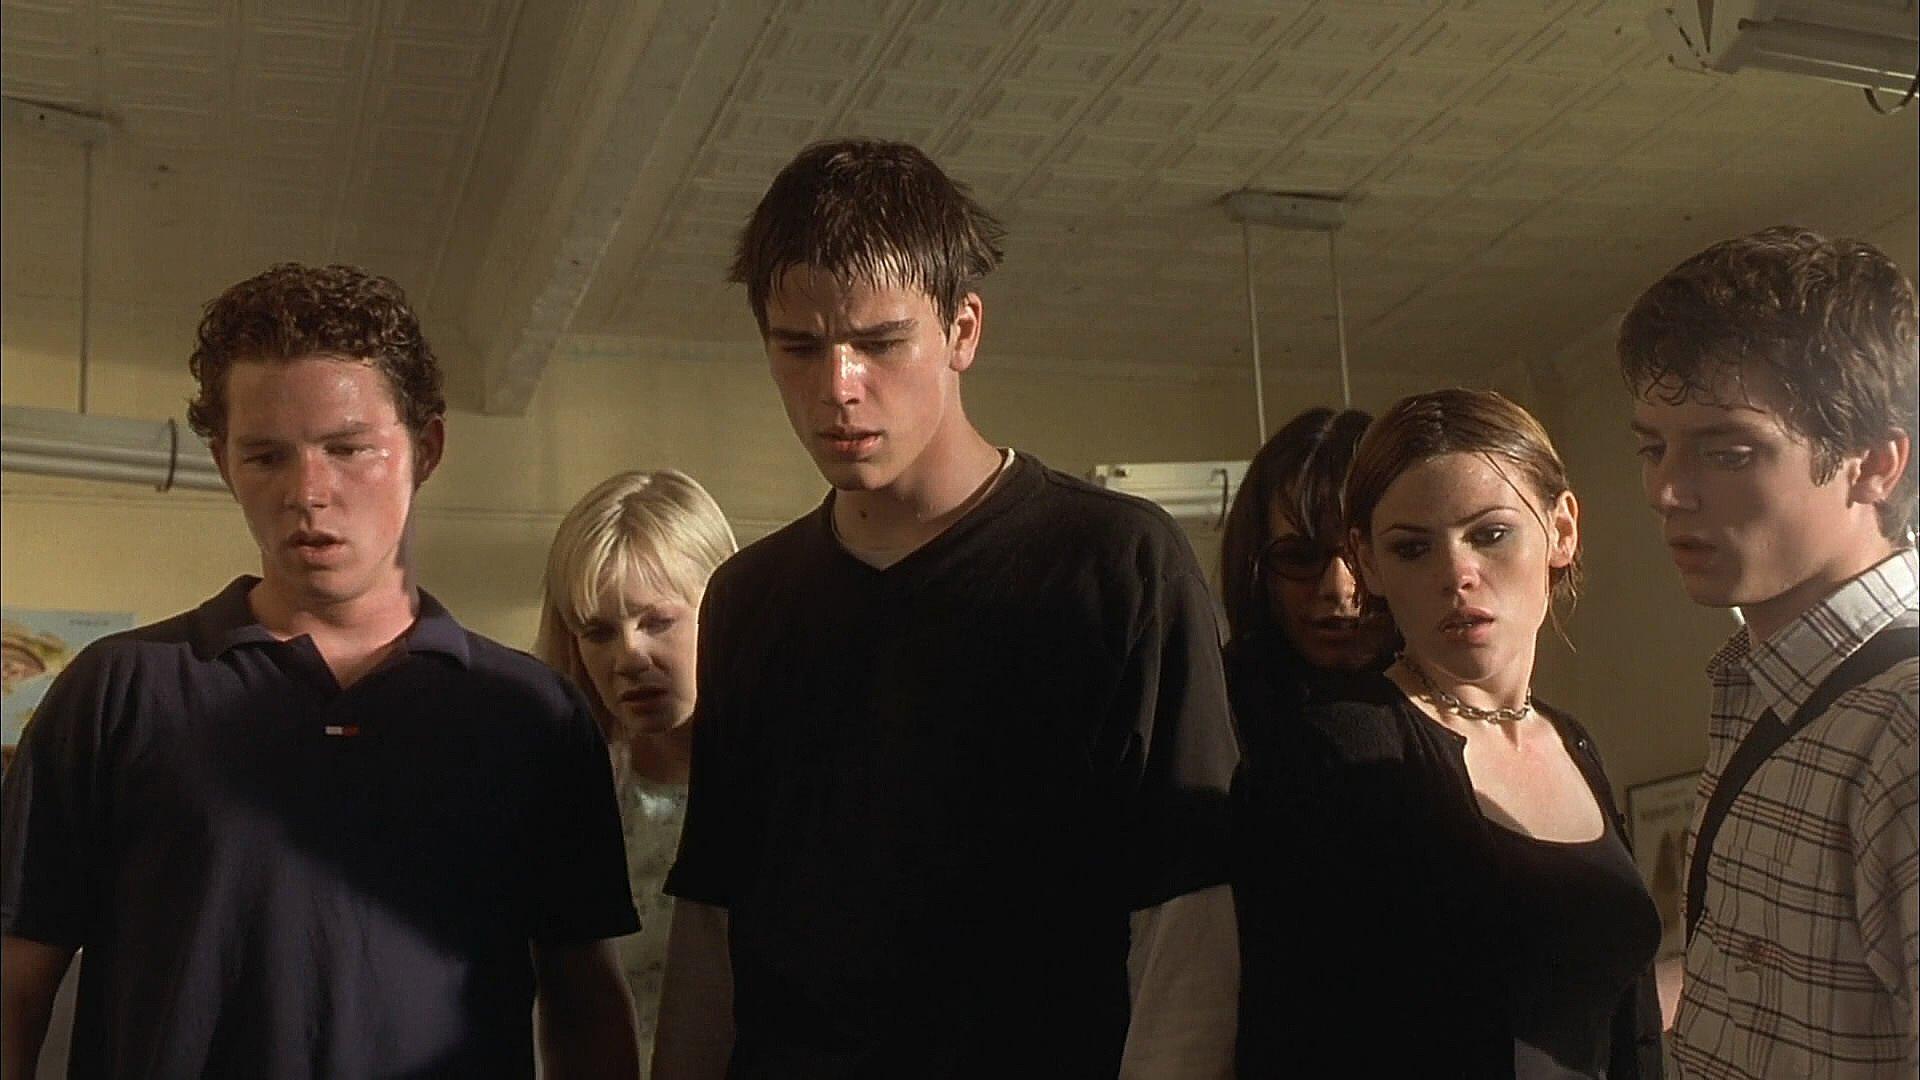 The Faculty cast